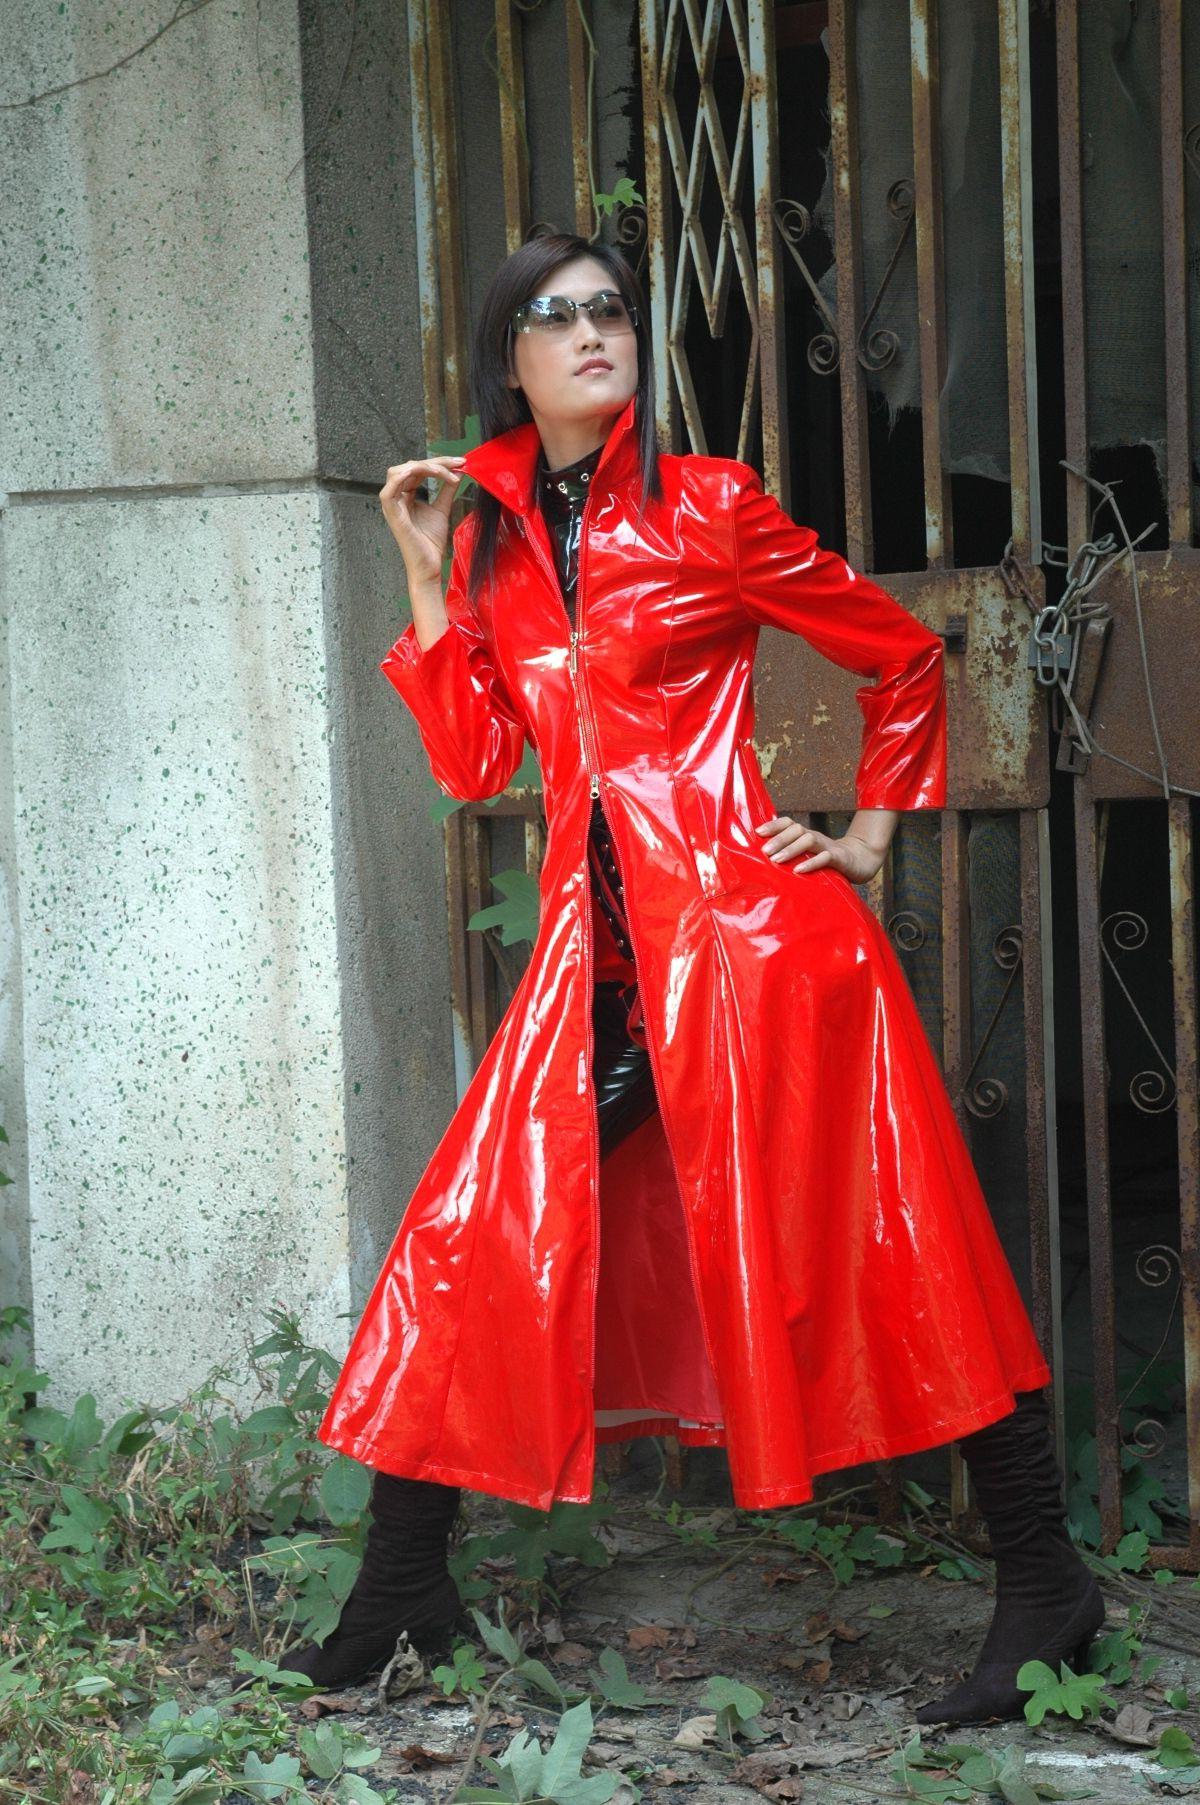 Mantel Pvc Drdp Genialer Lack Mantel Lackmà Ntel Raincoat Pvc Raincoat Und Red